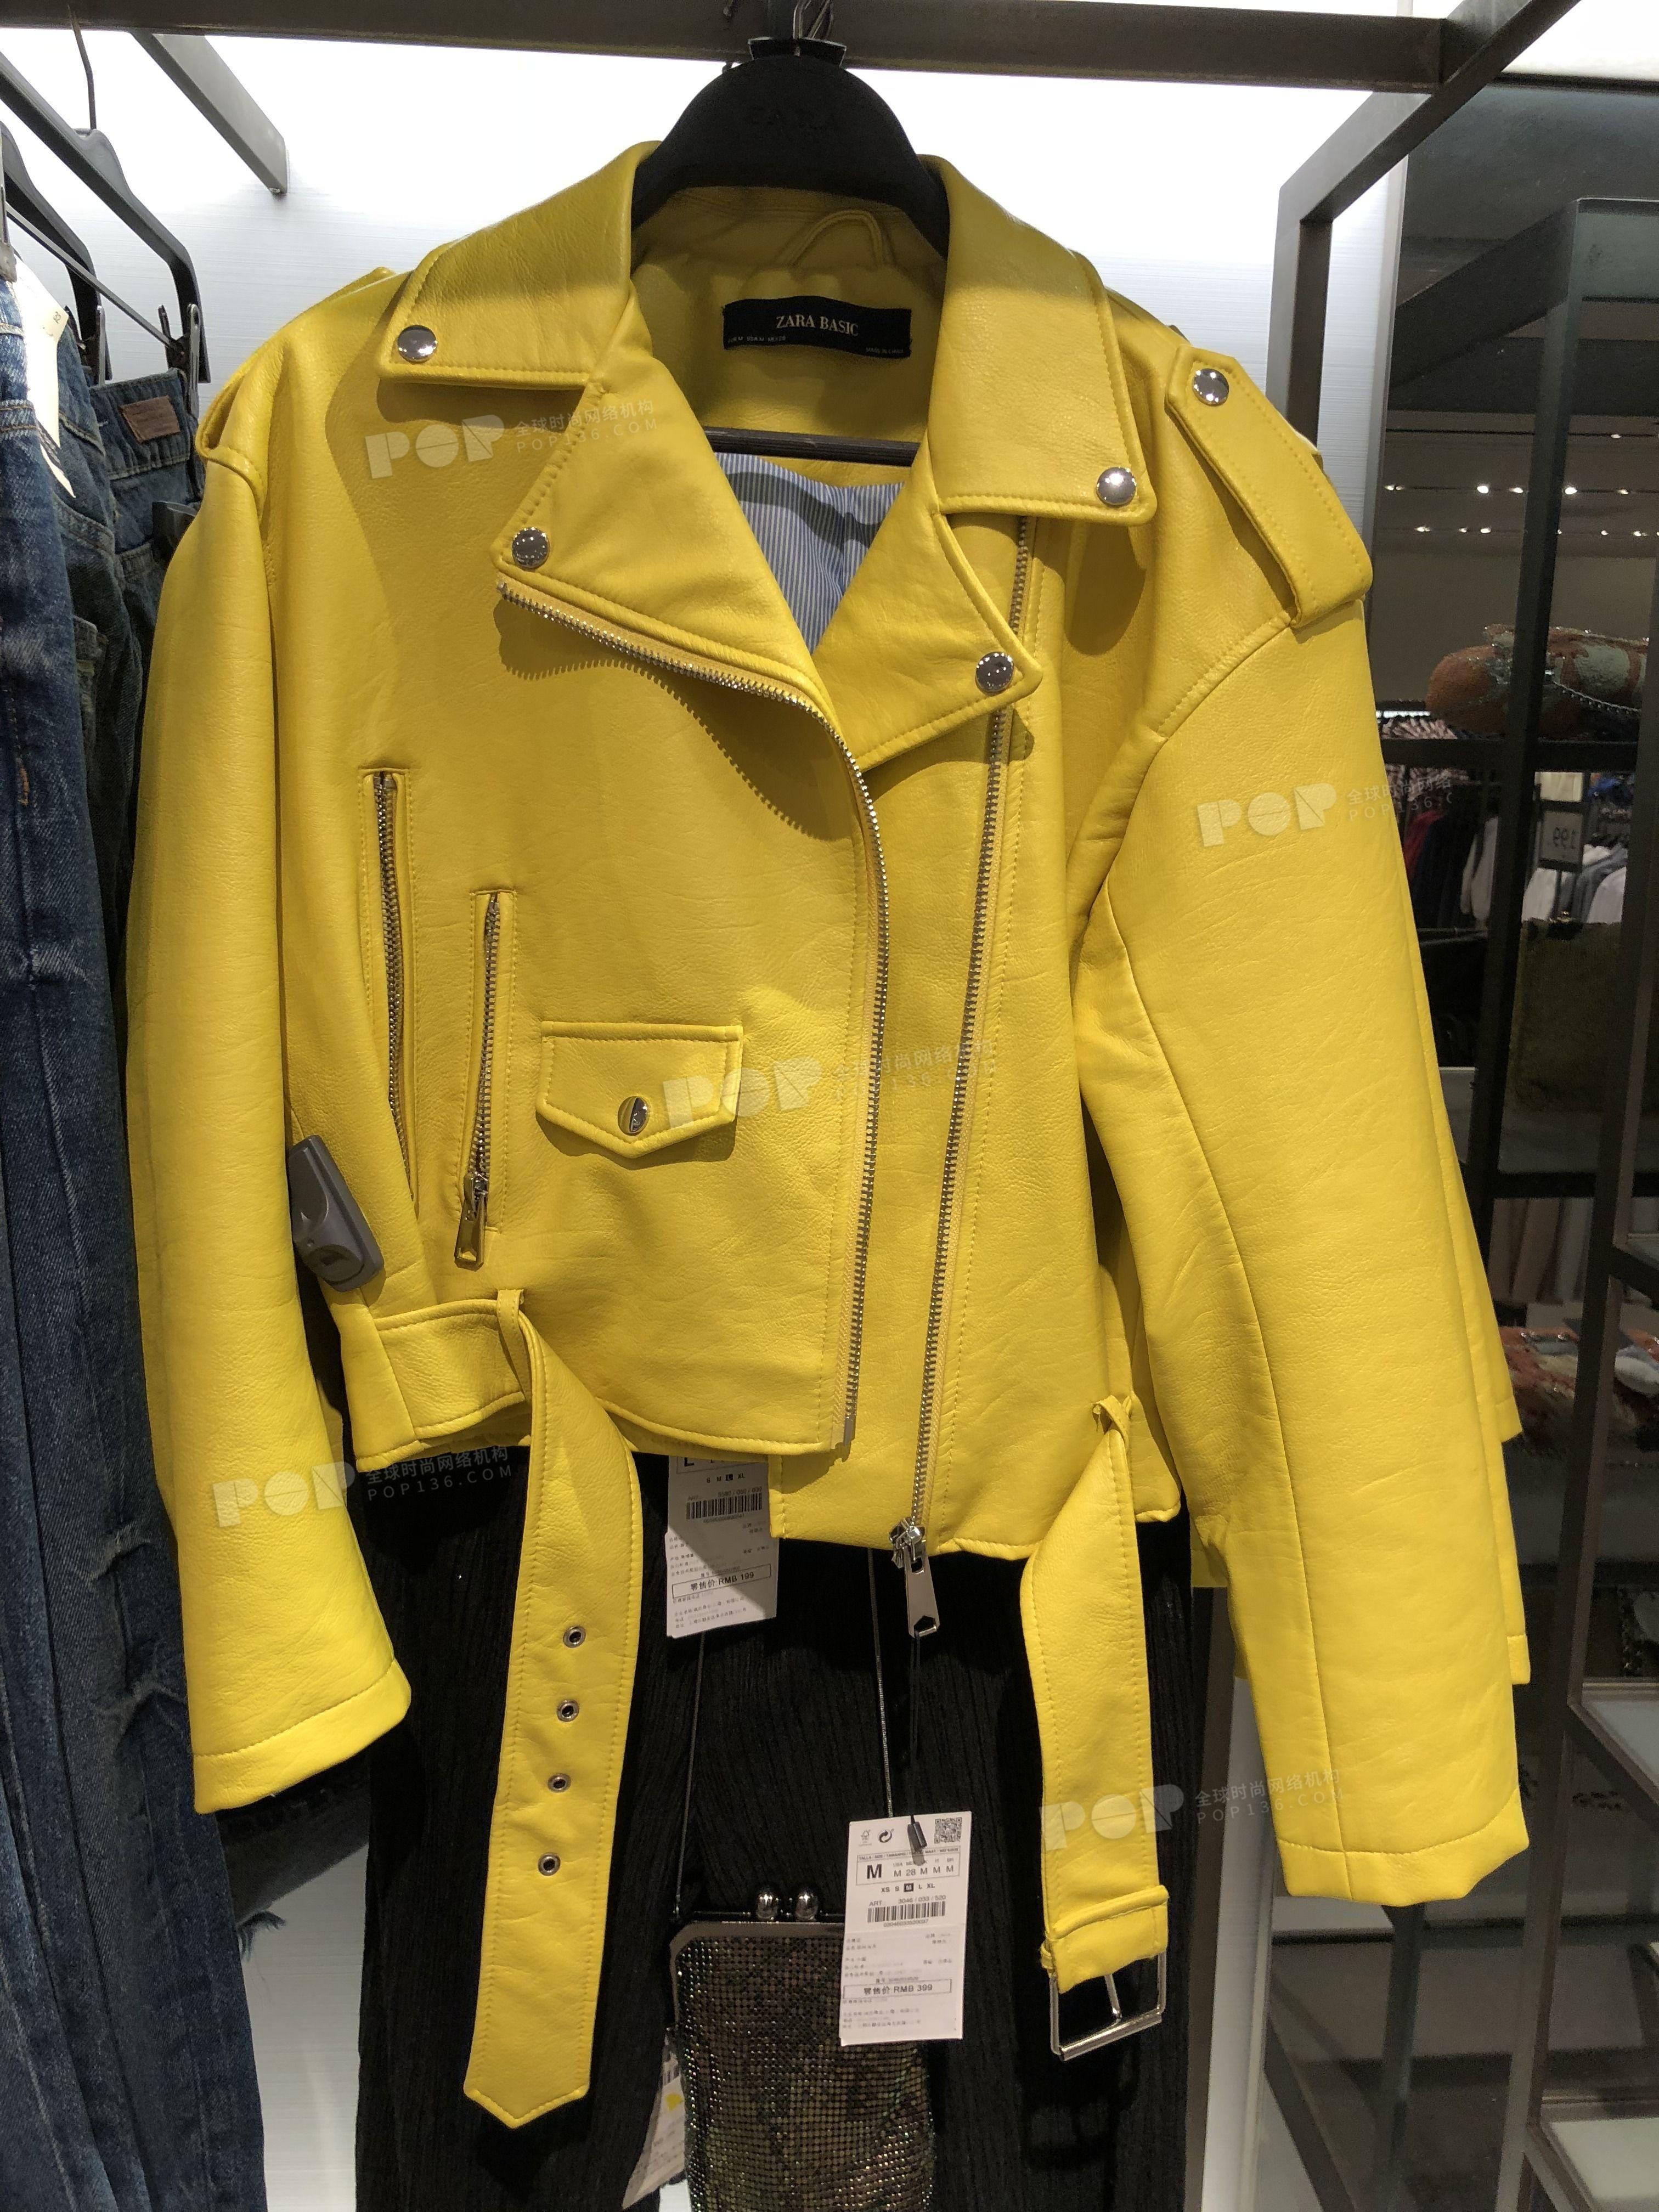 Pop Fashion Womenswear 2018ss Hangzhou Zara Outerwear Jacket Leather Clothing Yellow Waistband Fashion Spri Leather Jacket Outerwear Jackets Red Leather Jacket [ 4032 x 3024 Pixel ]